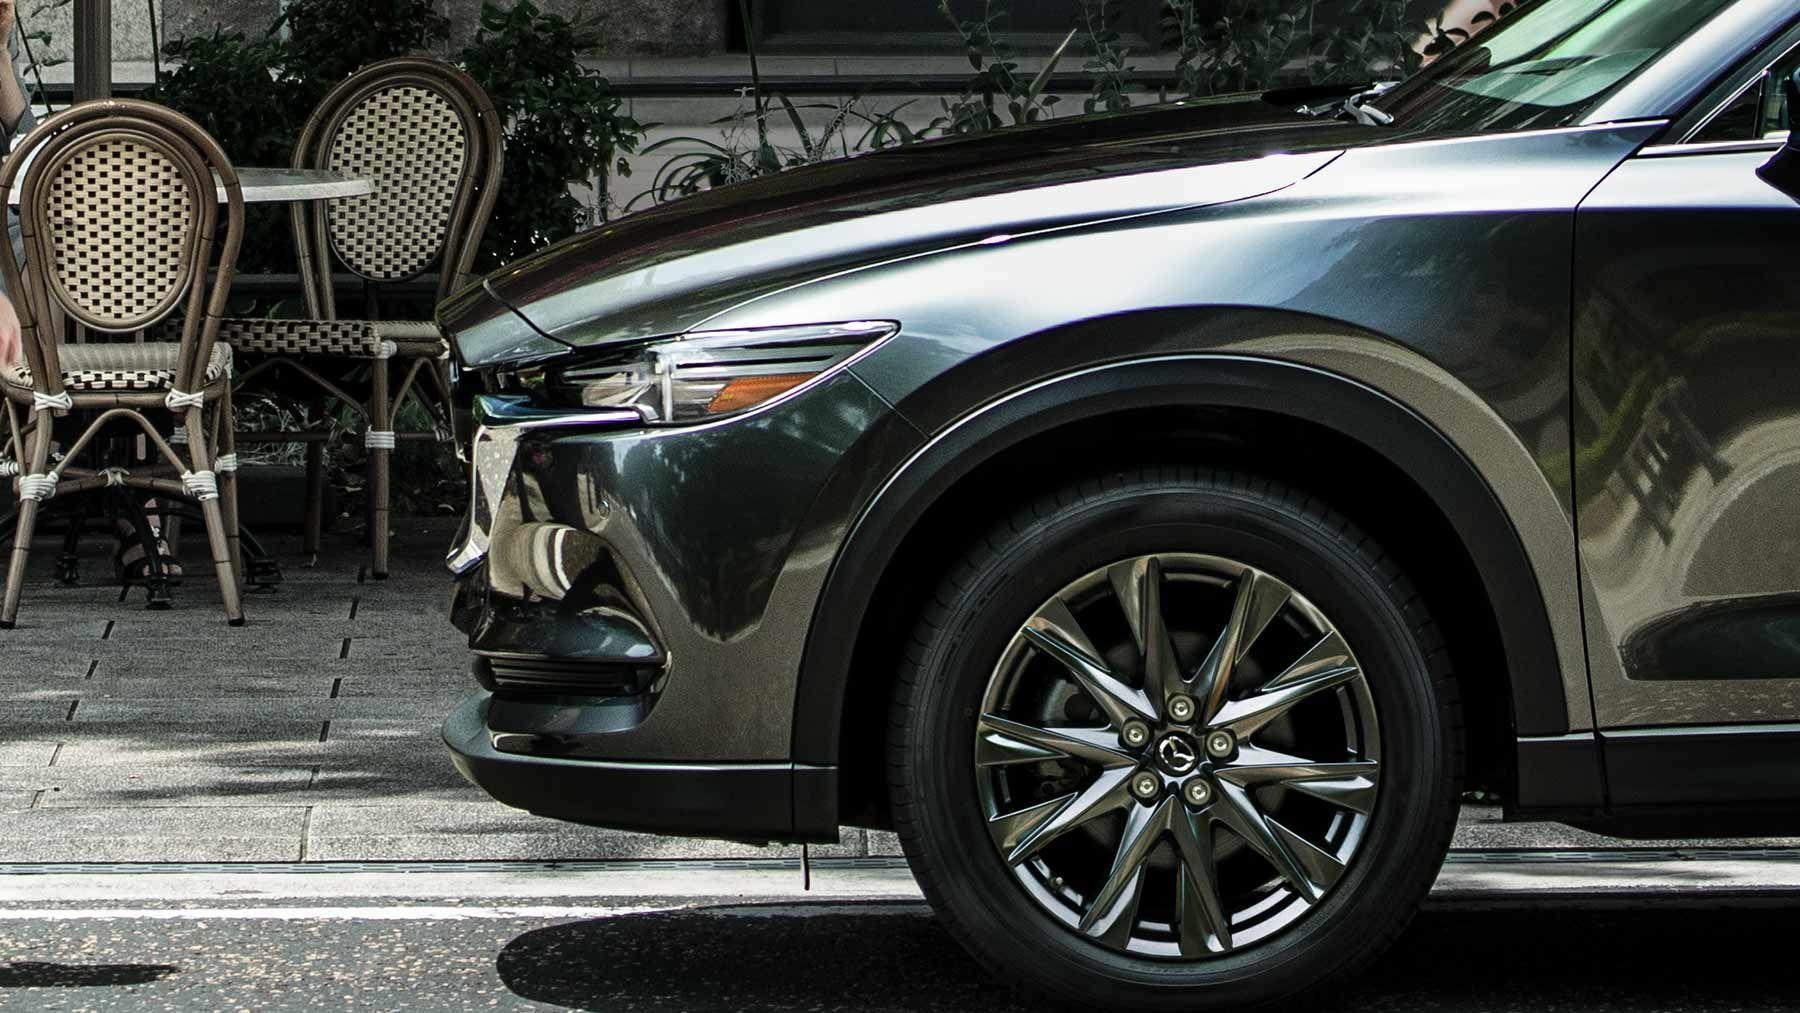 Kelebihan Kekurangan Mazda Cx 2019 Review